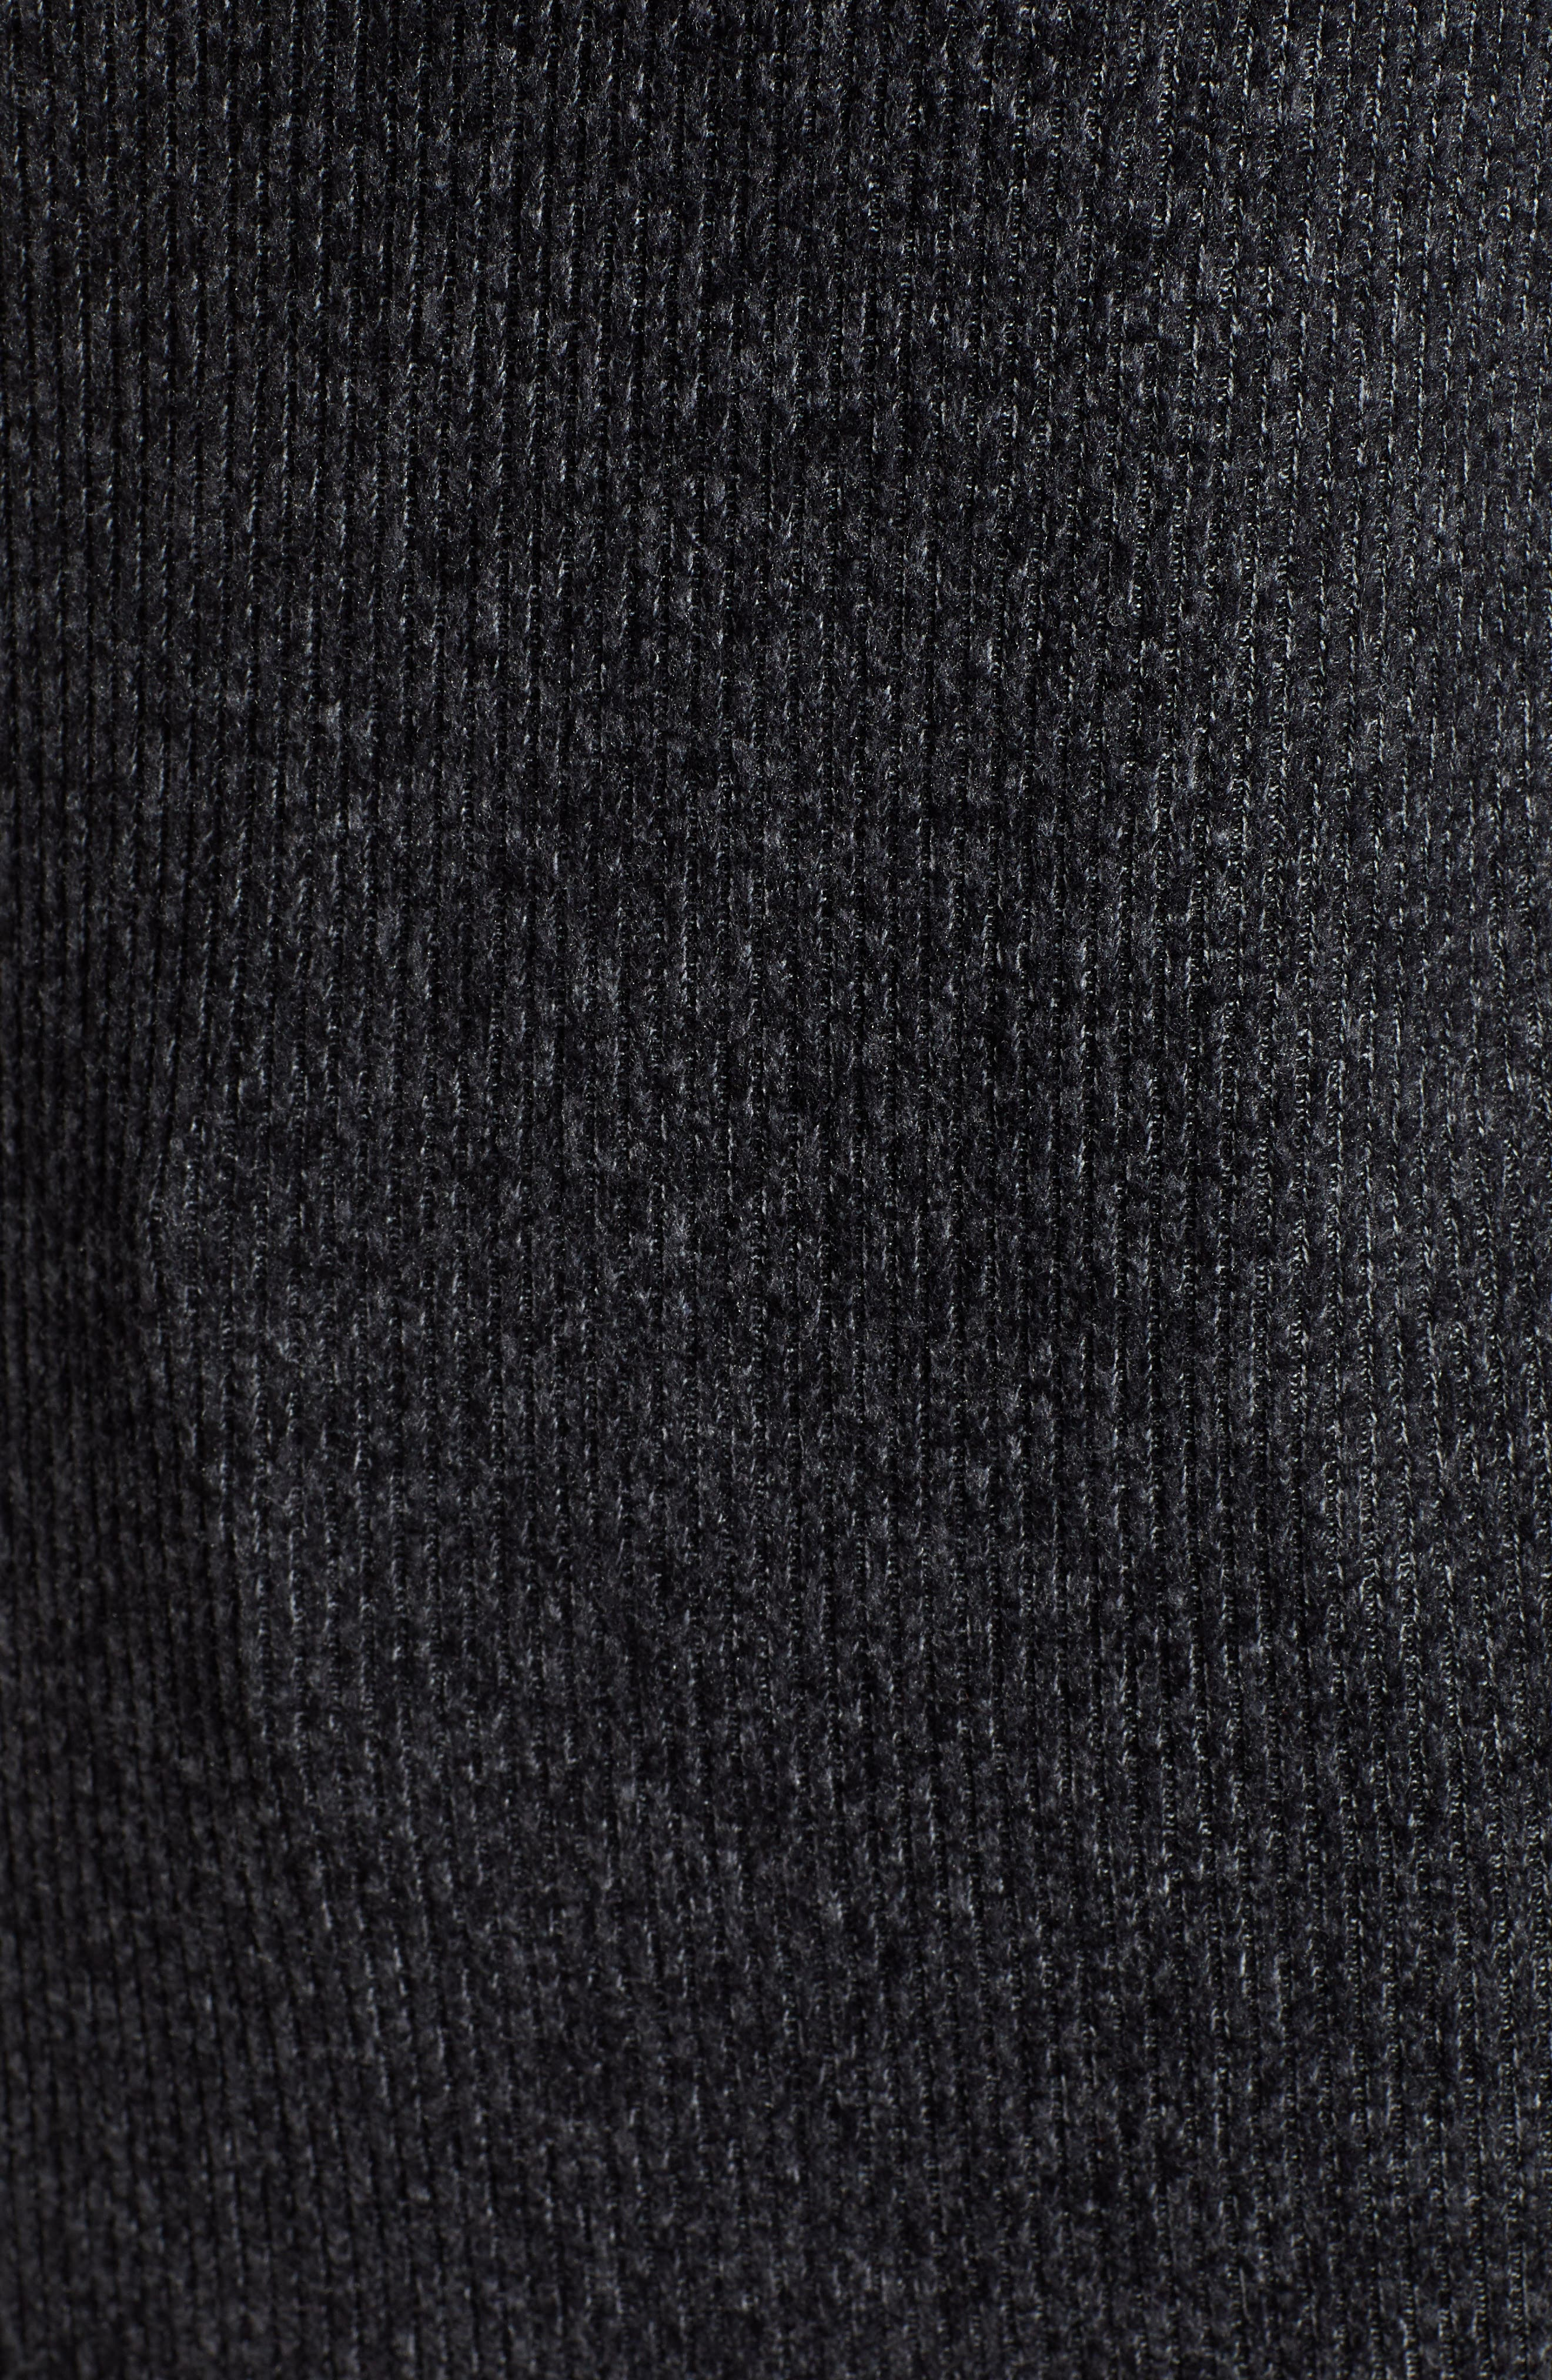 Ribbed Knit Top,                             Alternate thumbnail 5, color,                             001